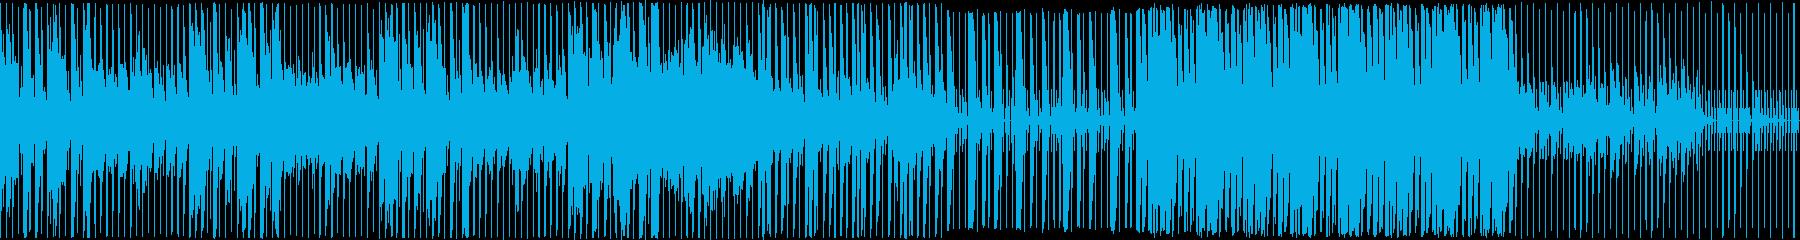 nothingの再生済みの波形